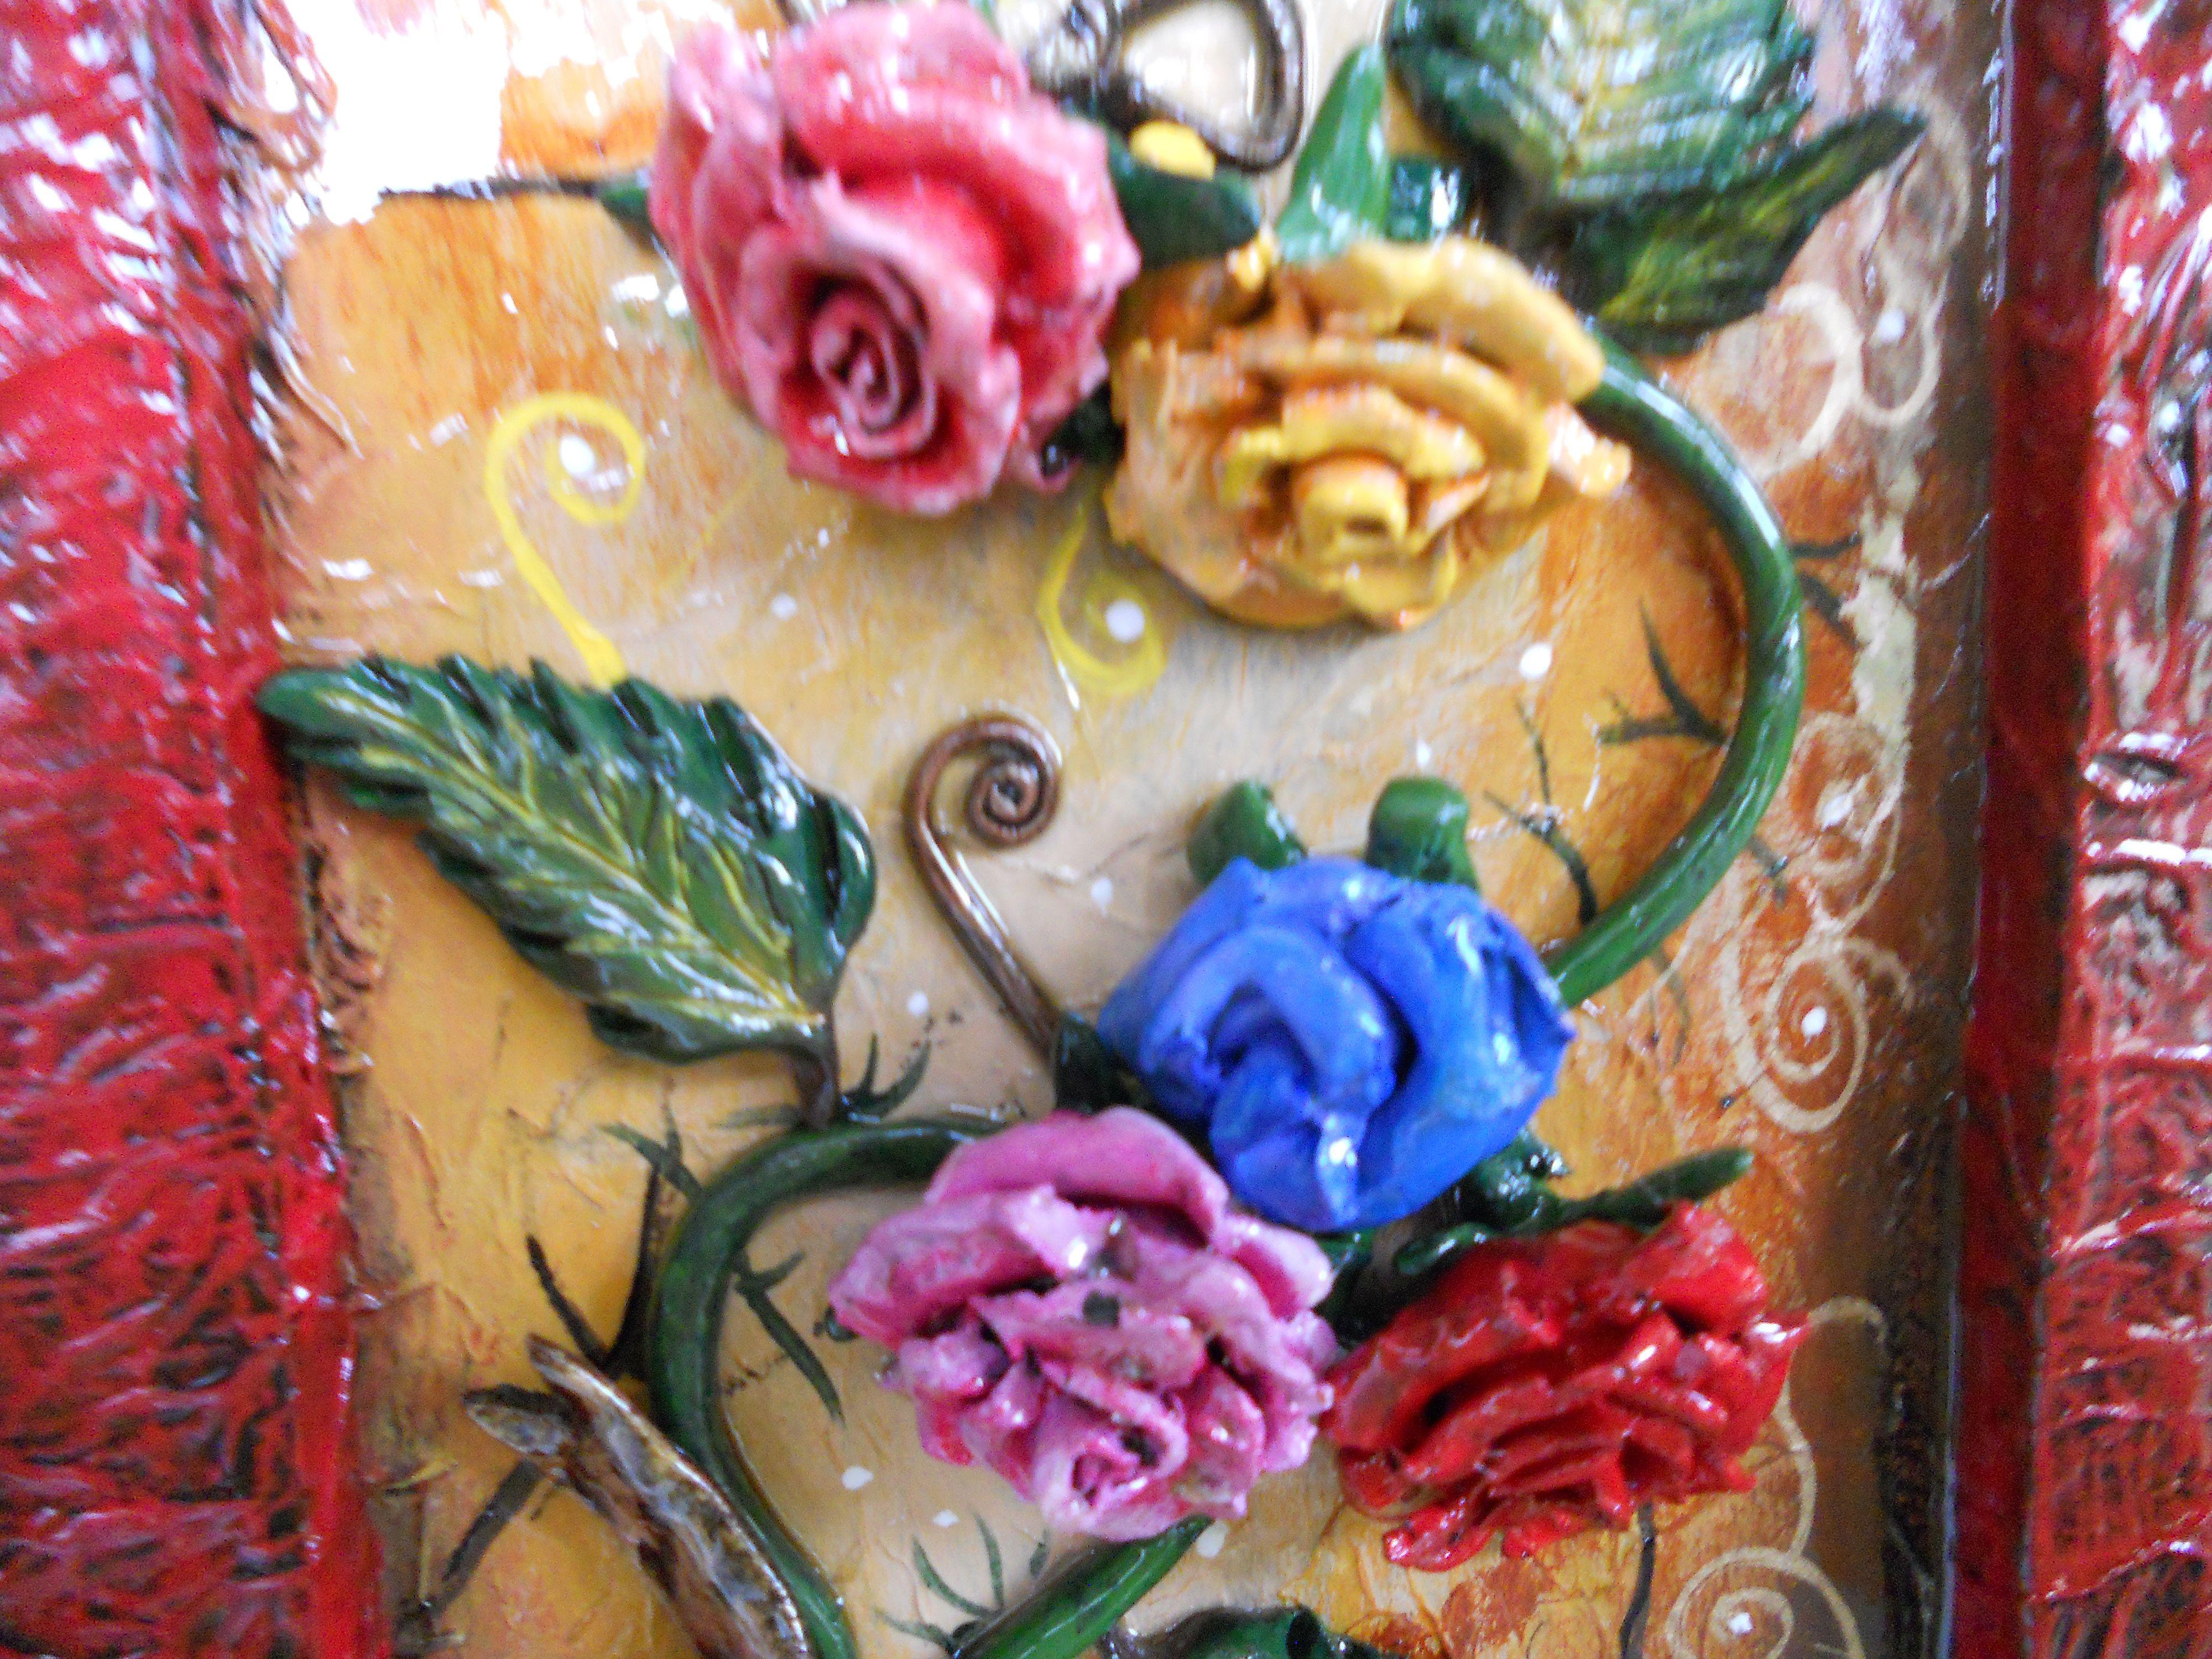 CUADRO DE ROSAS / TABLE OF ROSES / TABLE DES ROSES | Cuadros de ...